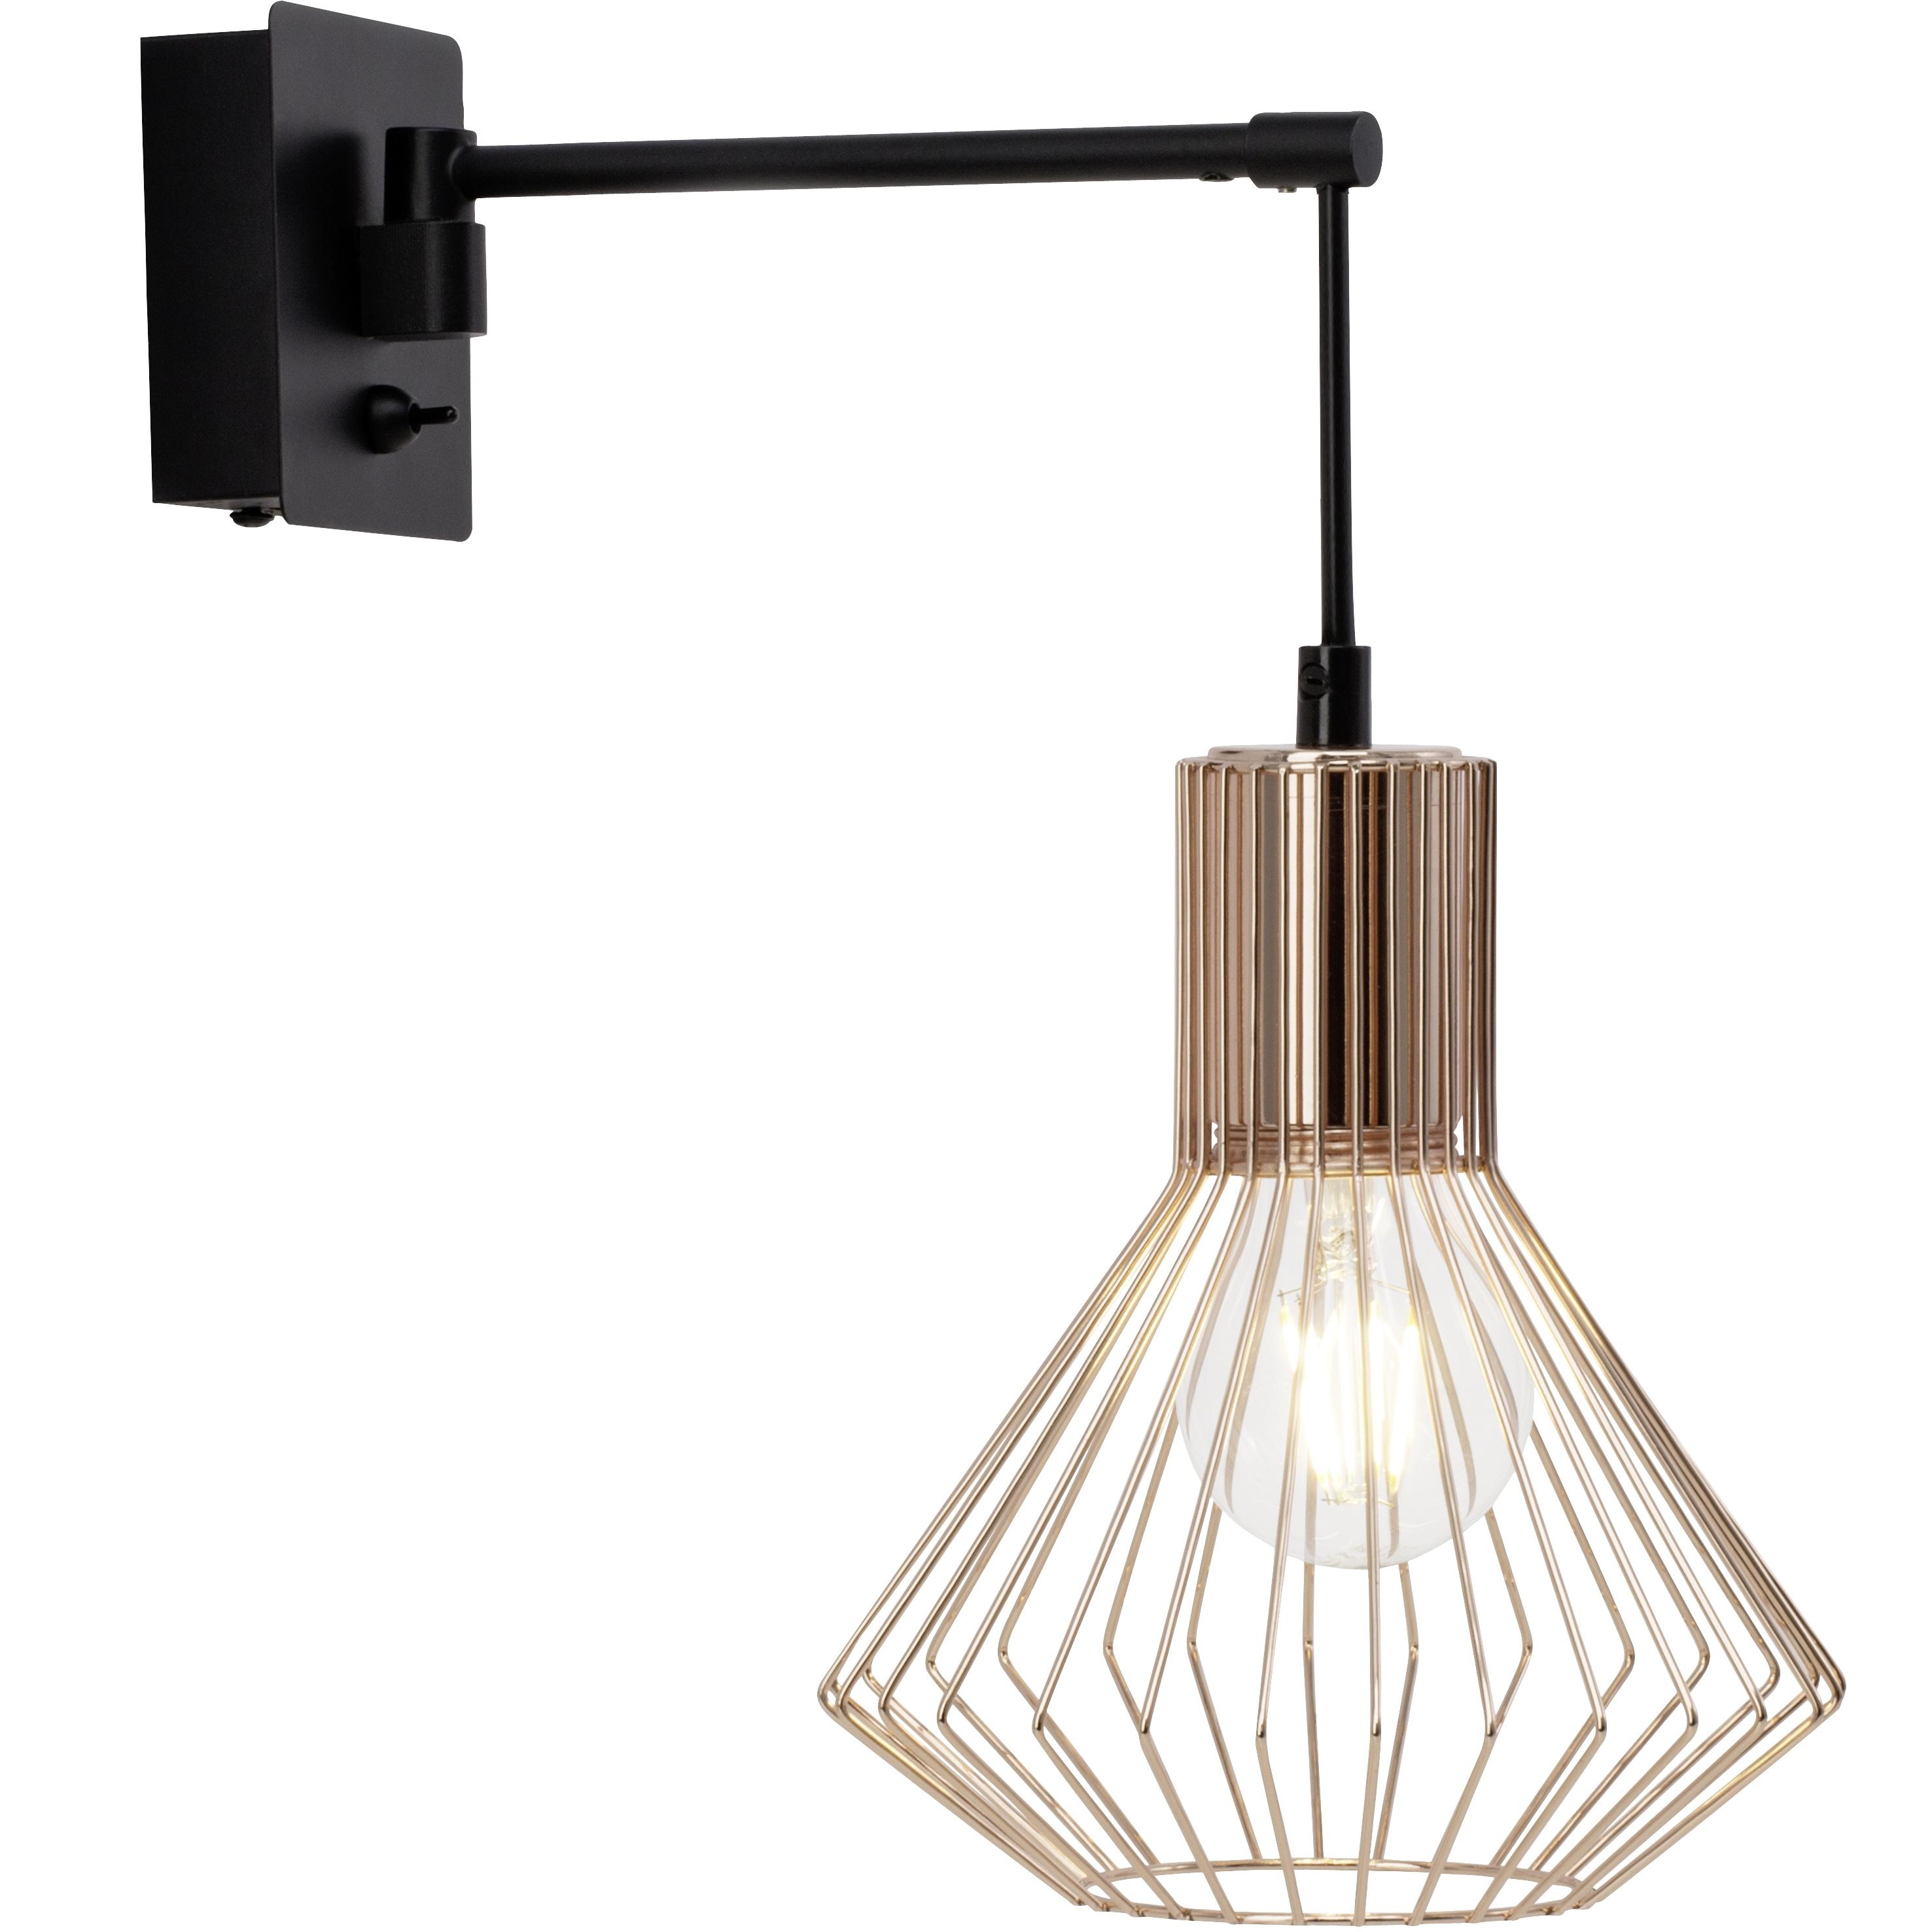 Brilliant Leuchten LED Wandleuchte, E27, Dalma Wandleuchte Schalter schwarz/kupfer